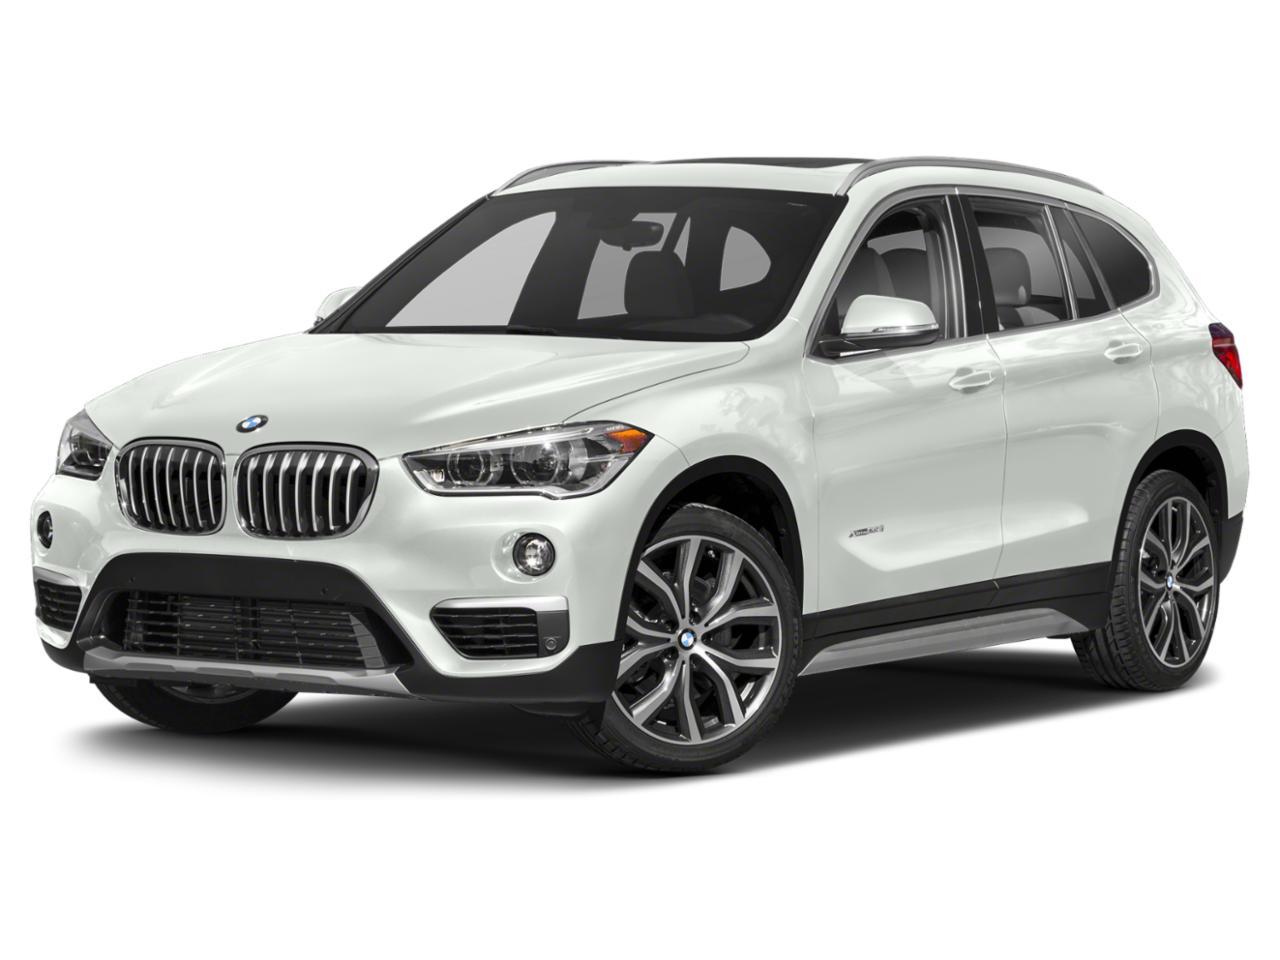 2018 BMW X1 xDrive28i Vehicle Photo in Allentown, PA 18103